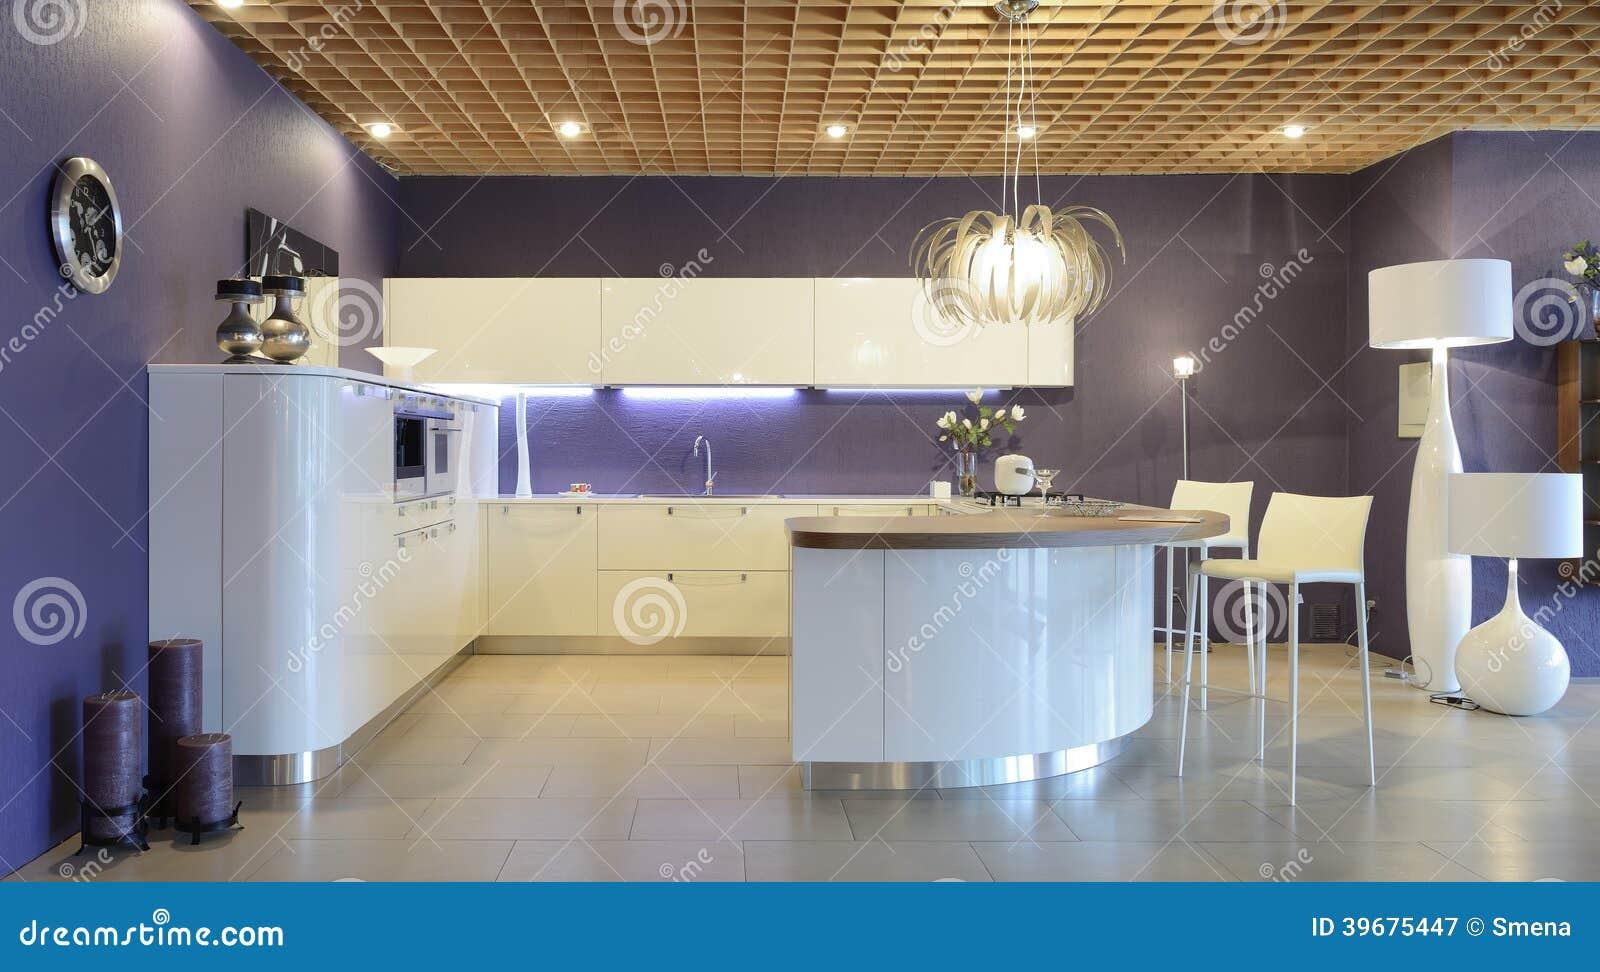 Binnenland van moderne keuken.